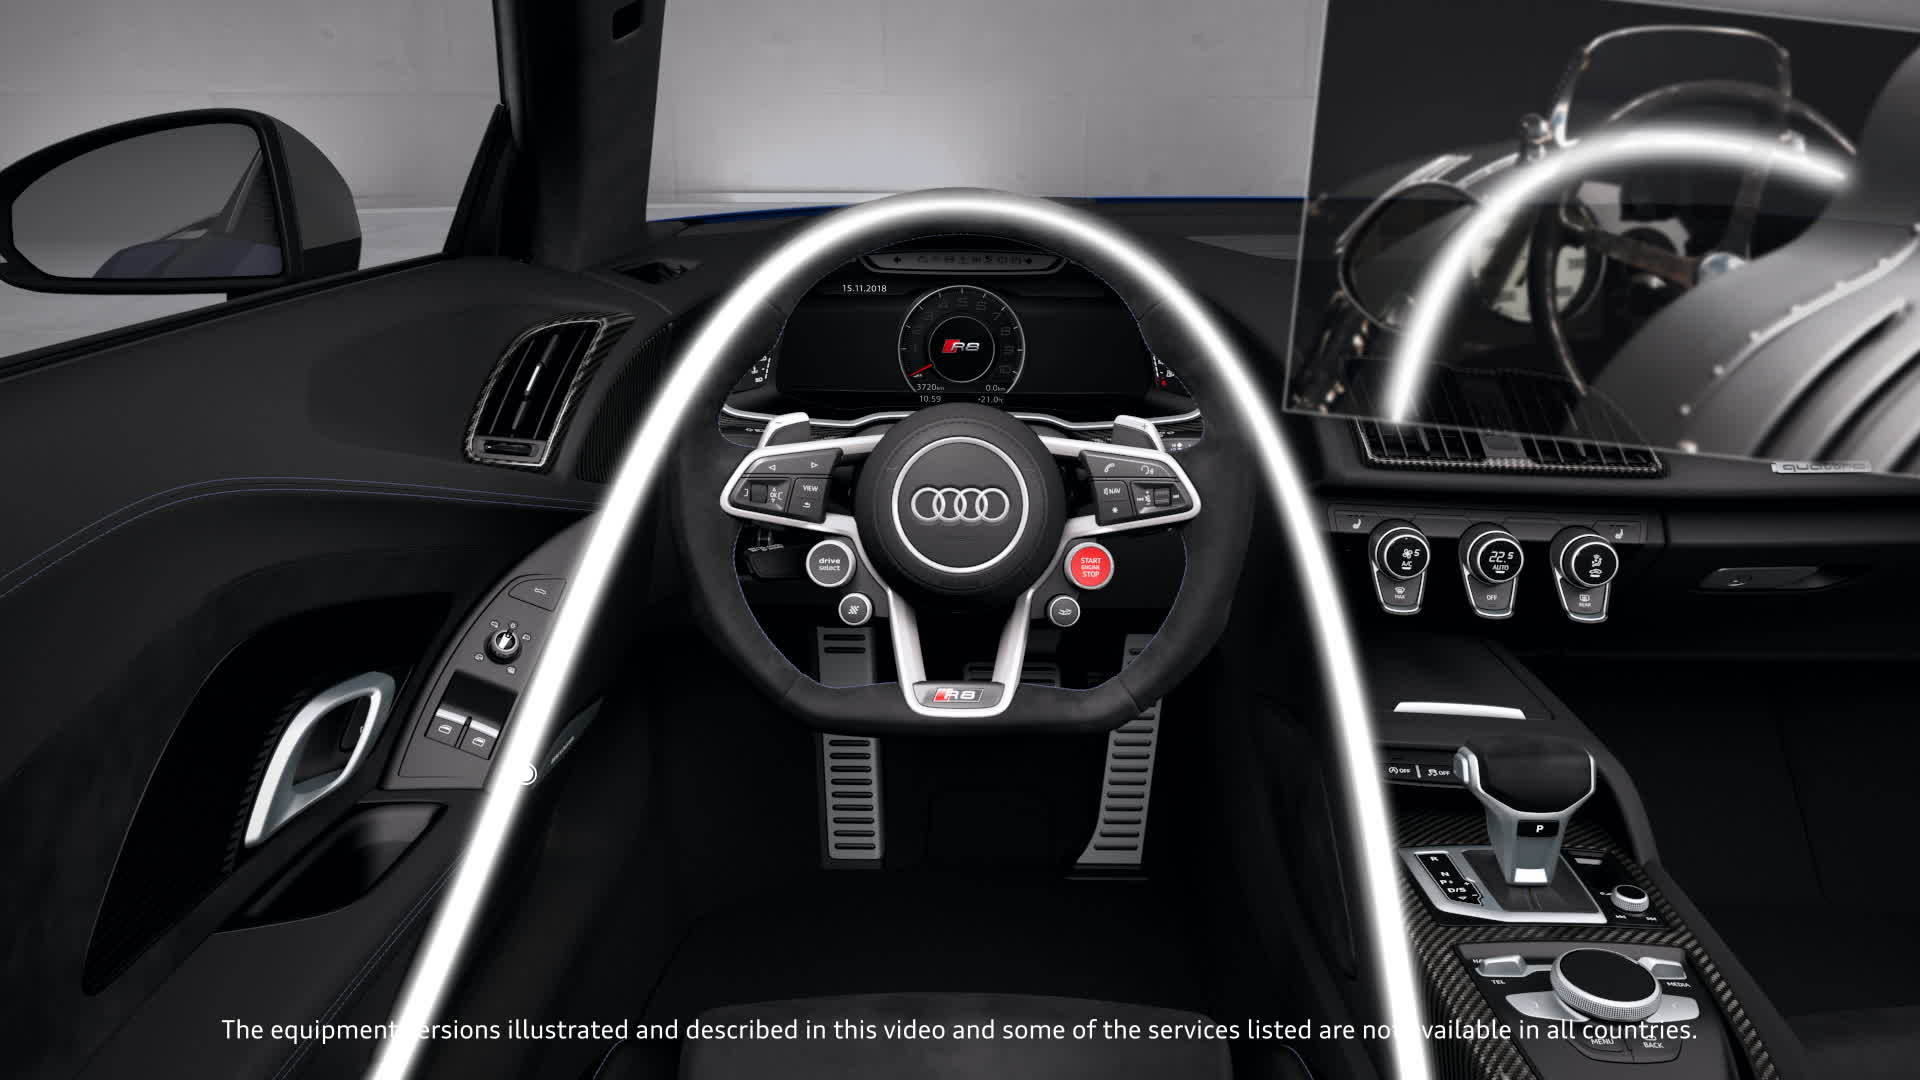 Audi R8 V10 Performance Quattro Interior Animation Video Audi Mediatv